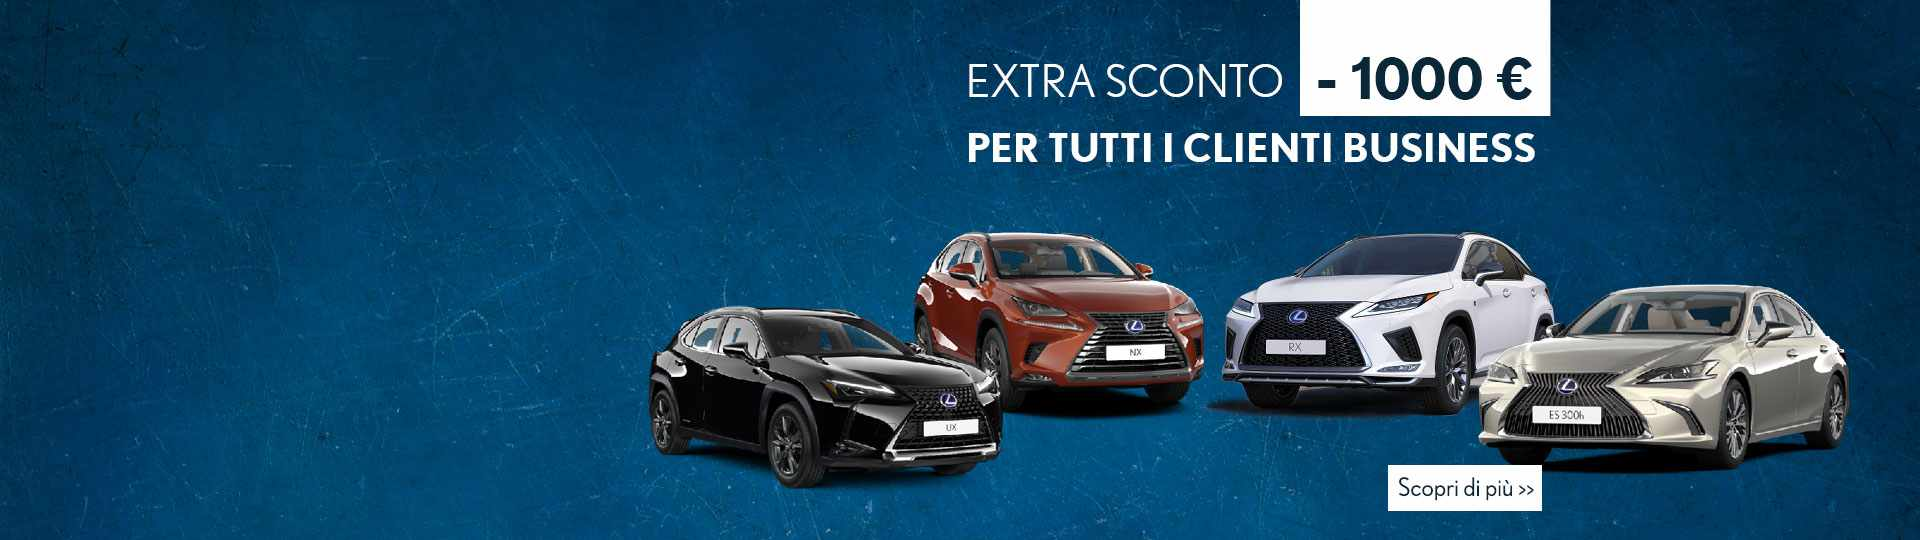 Sconto-Lexus-Business-min.jpg